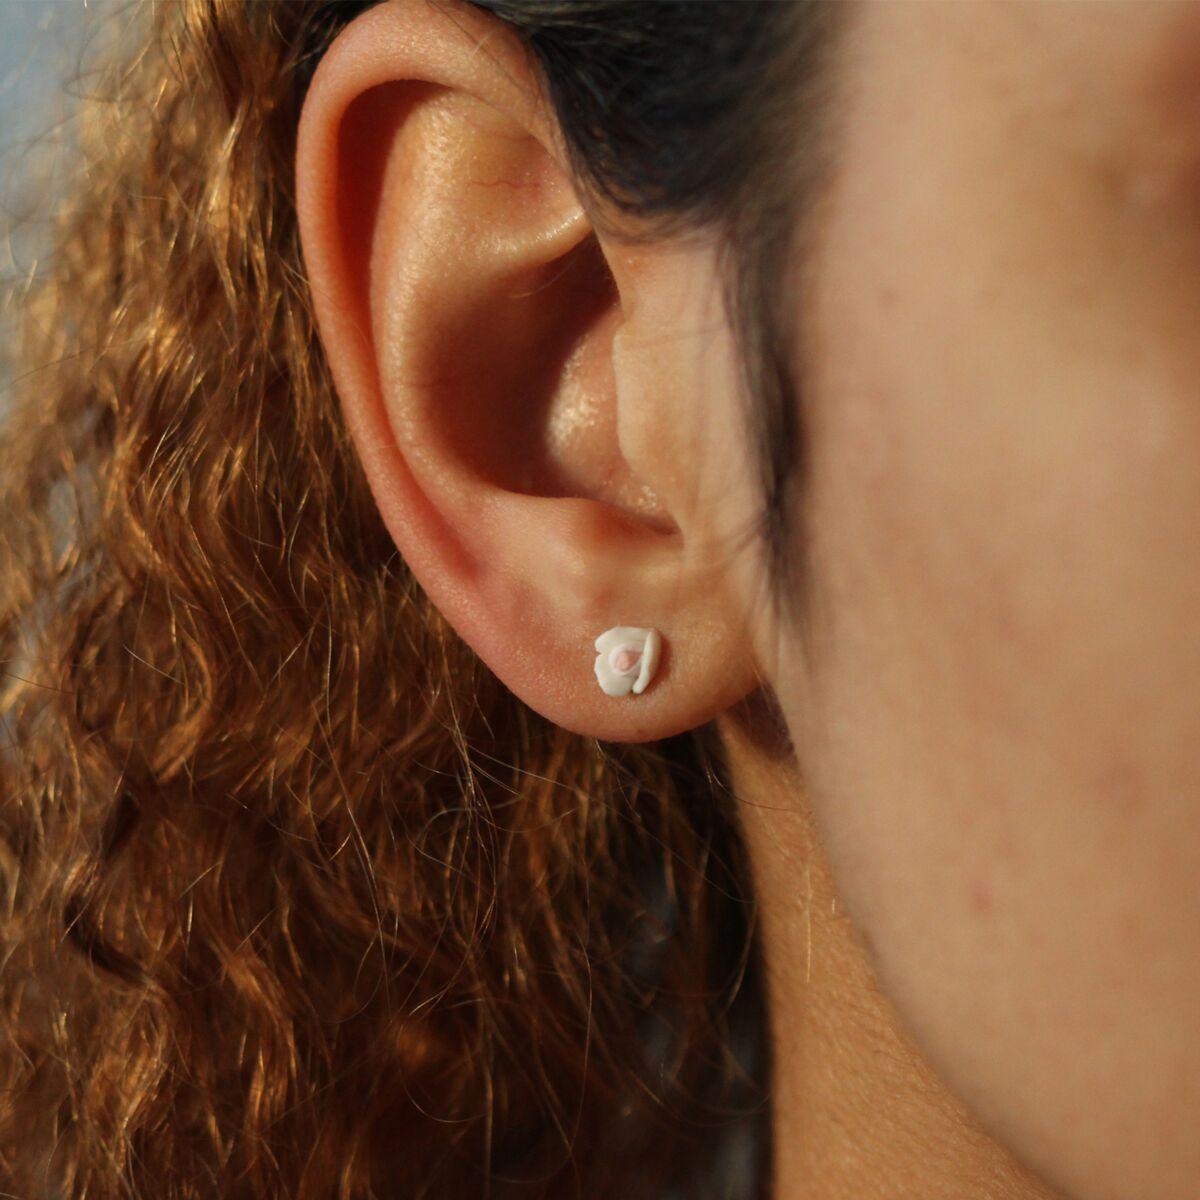 Marzipan Rose Earrings, Snow White image